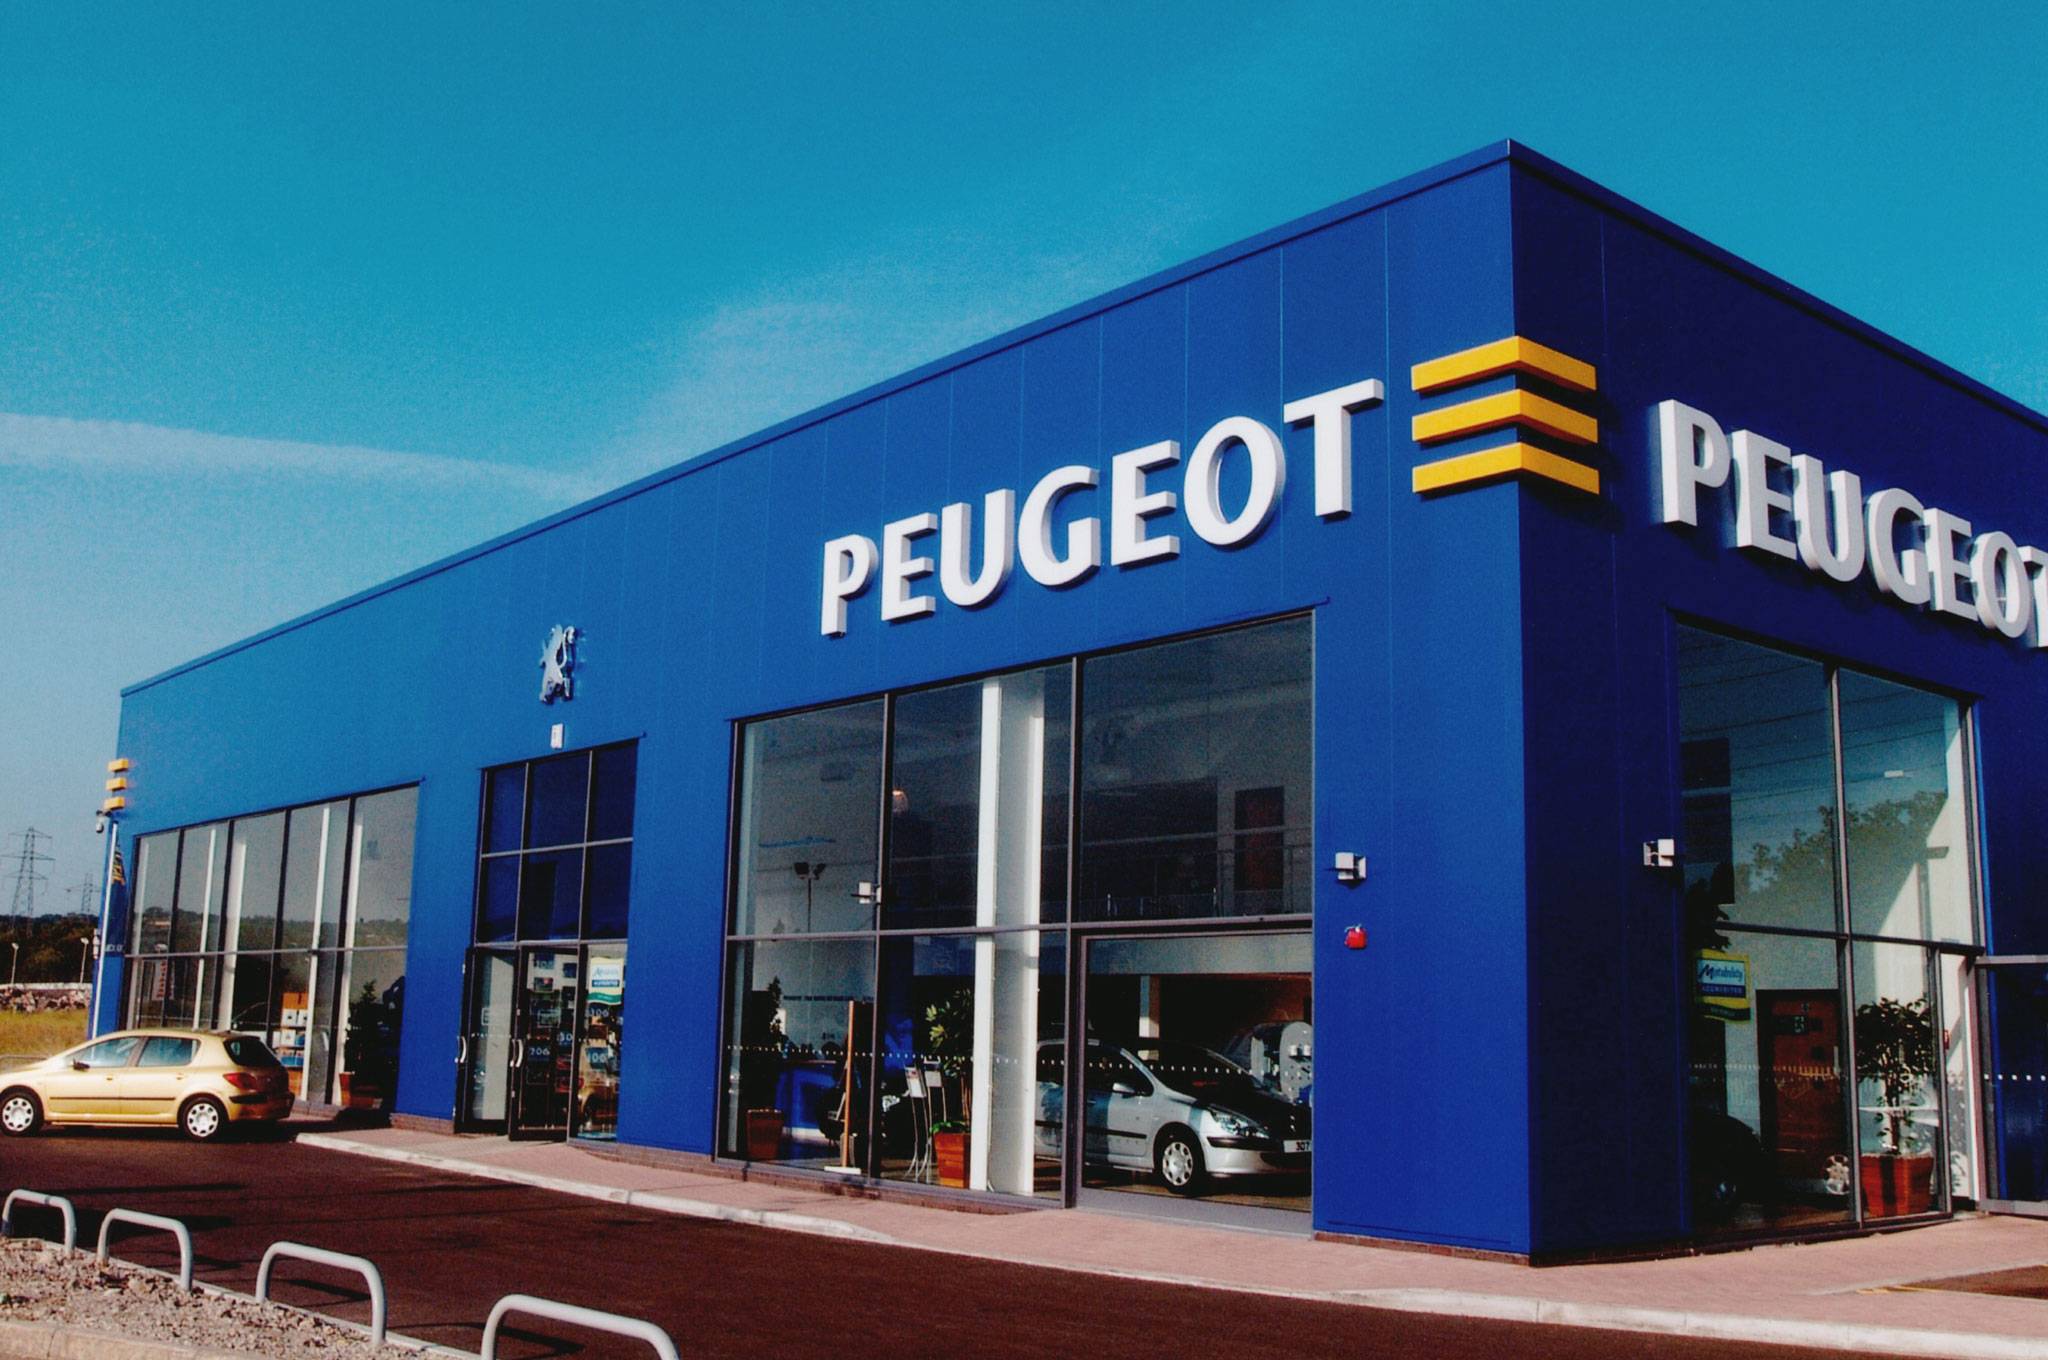 Peugeot Dealership UK1